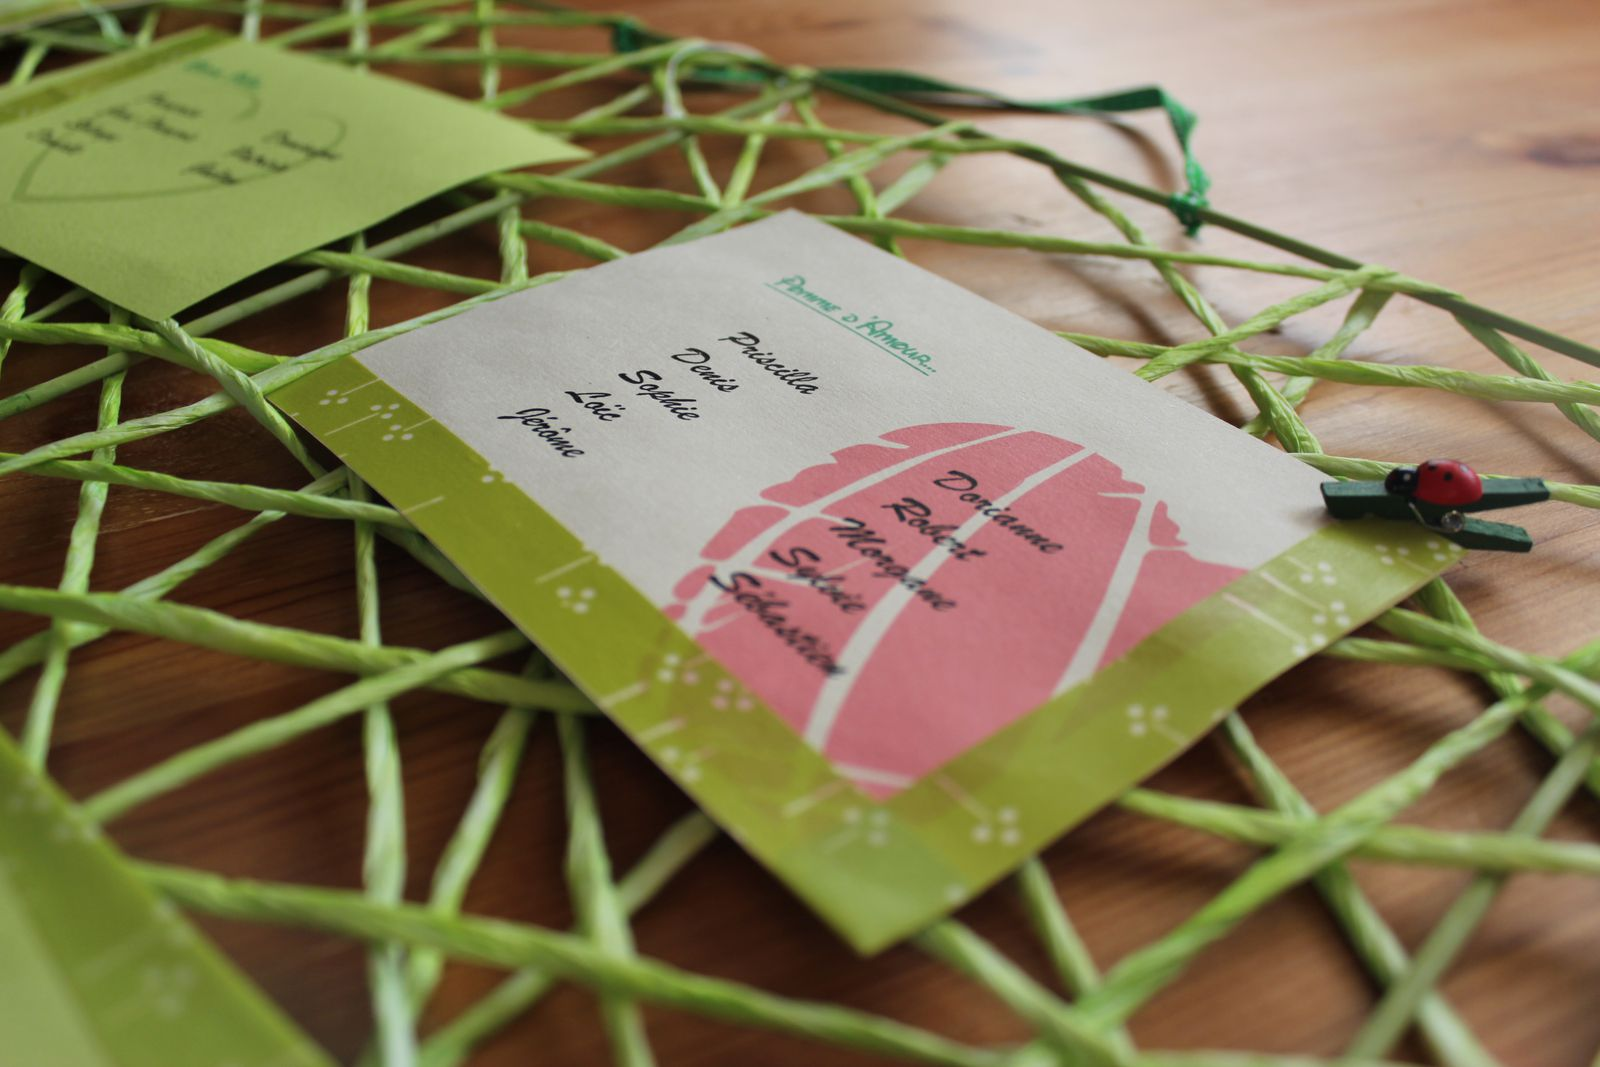 http://luniversdegarfield59.over-blog.com mariage plan table theme pomme vert ivoire